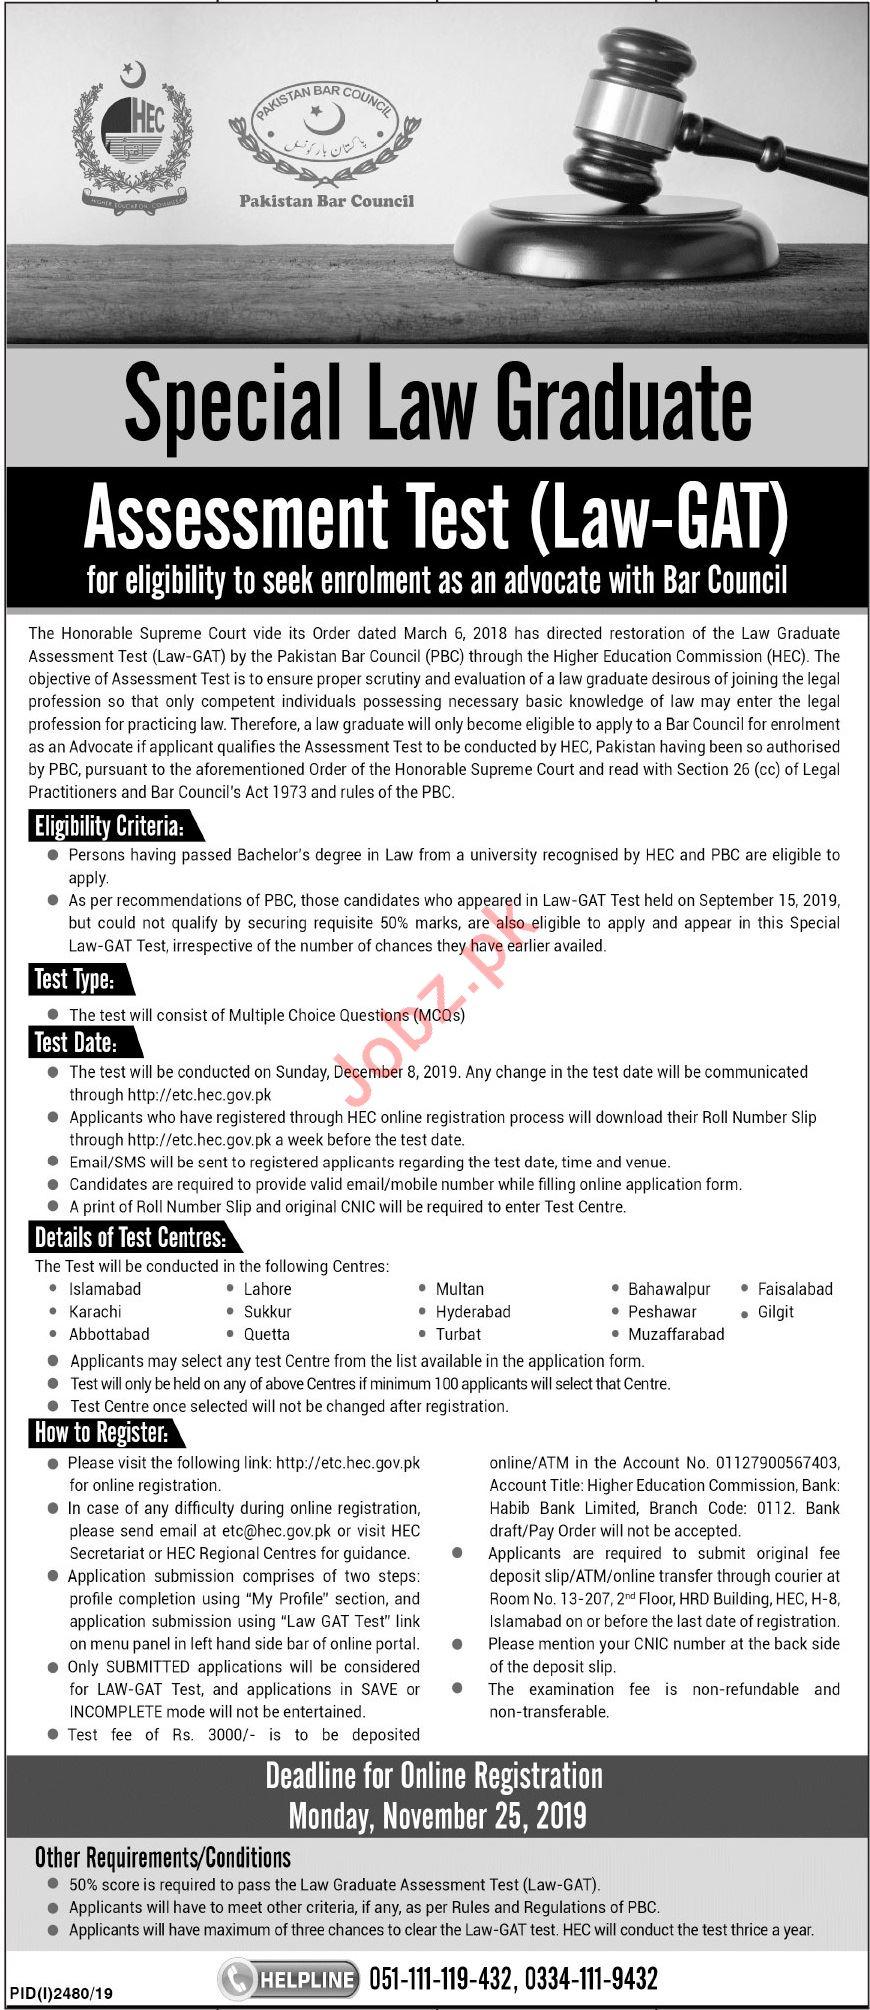 Pakistan Bar Council GAT Test 2019